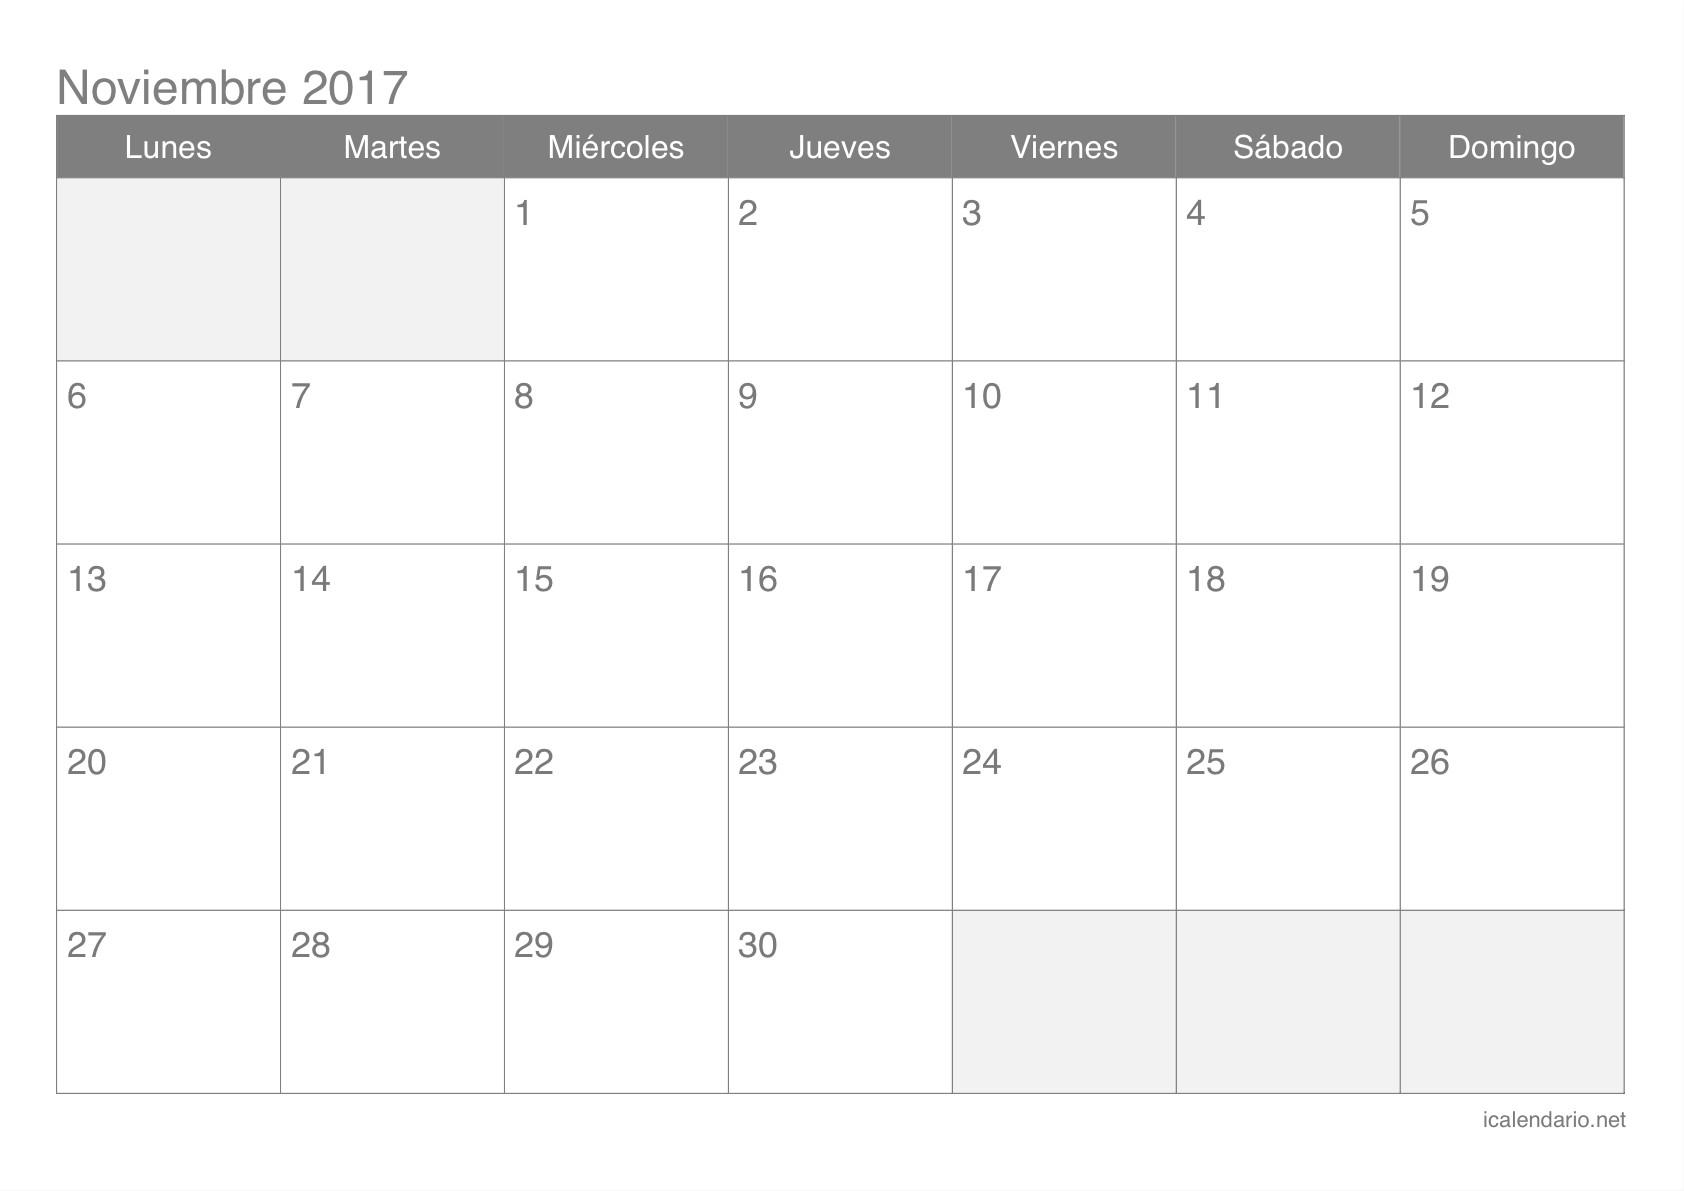 Calendario De Noviembre 2017 Para Imprimir Mejores Y Más Novedosos Calendario Noviembre 2017 Para Imprimir Icalendario